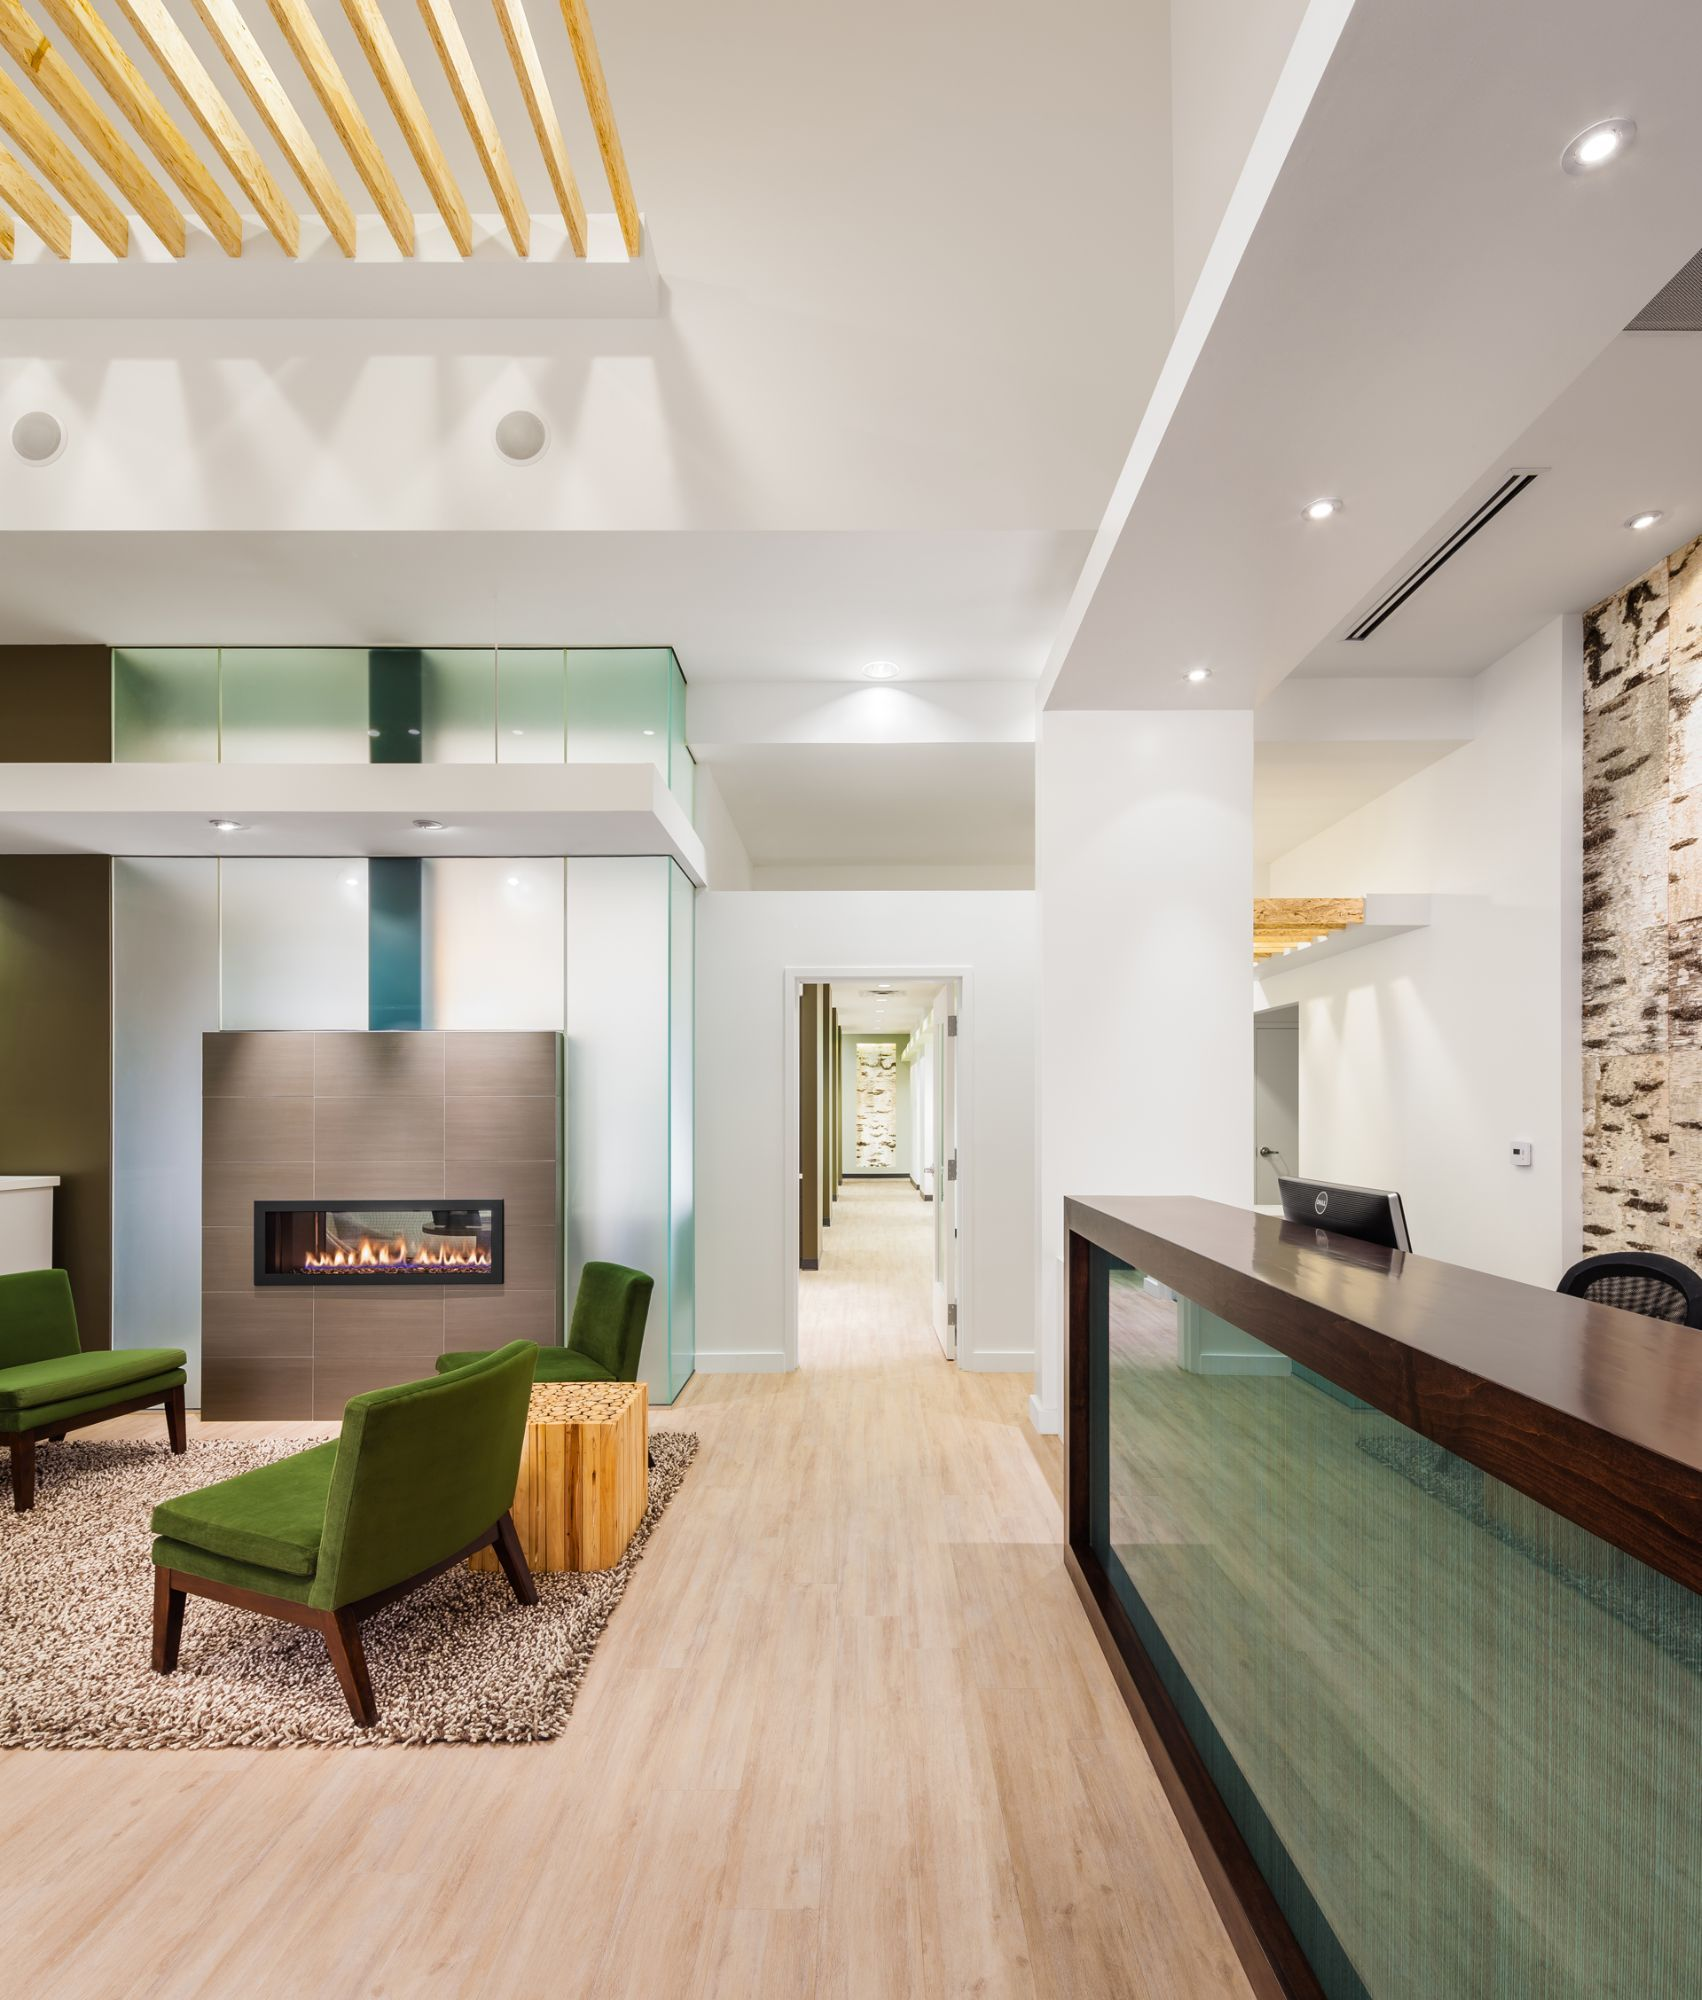 Dental Office Design: Dentistry at Golden Ridge | Dental ...